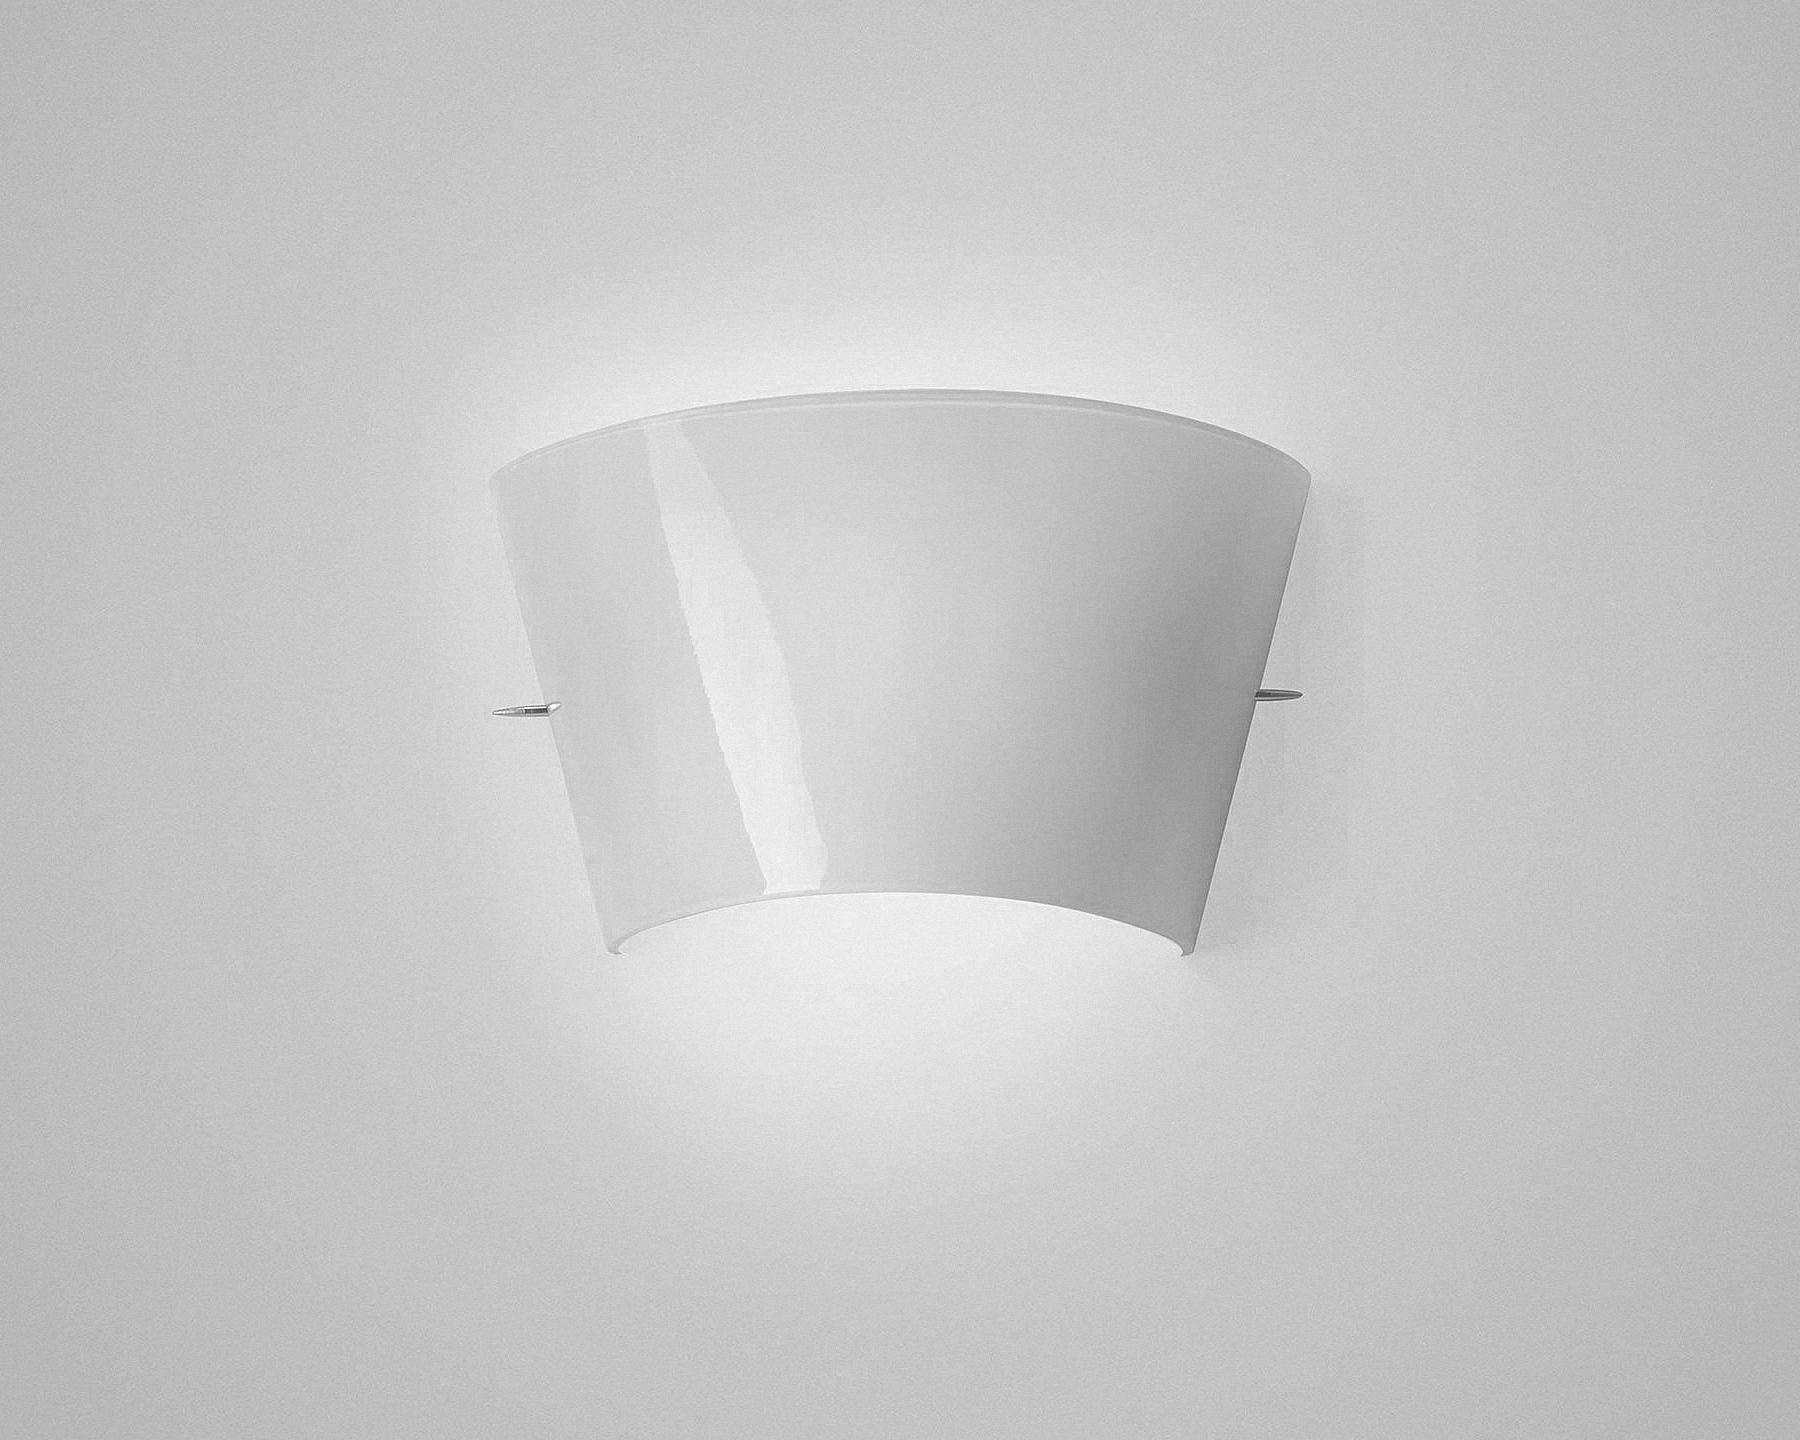 Applique moderna in metacrilato a lampada fluorescente tonda